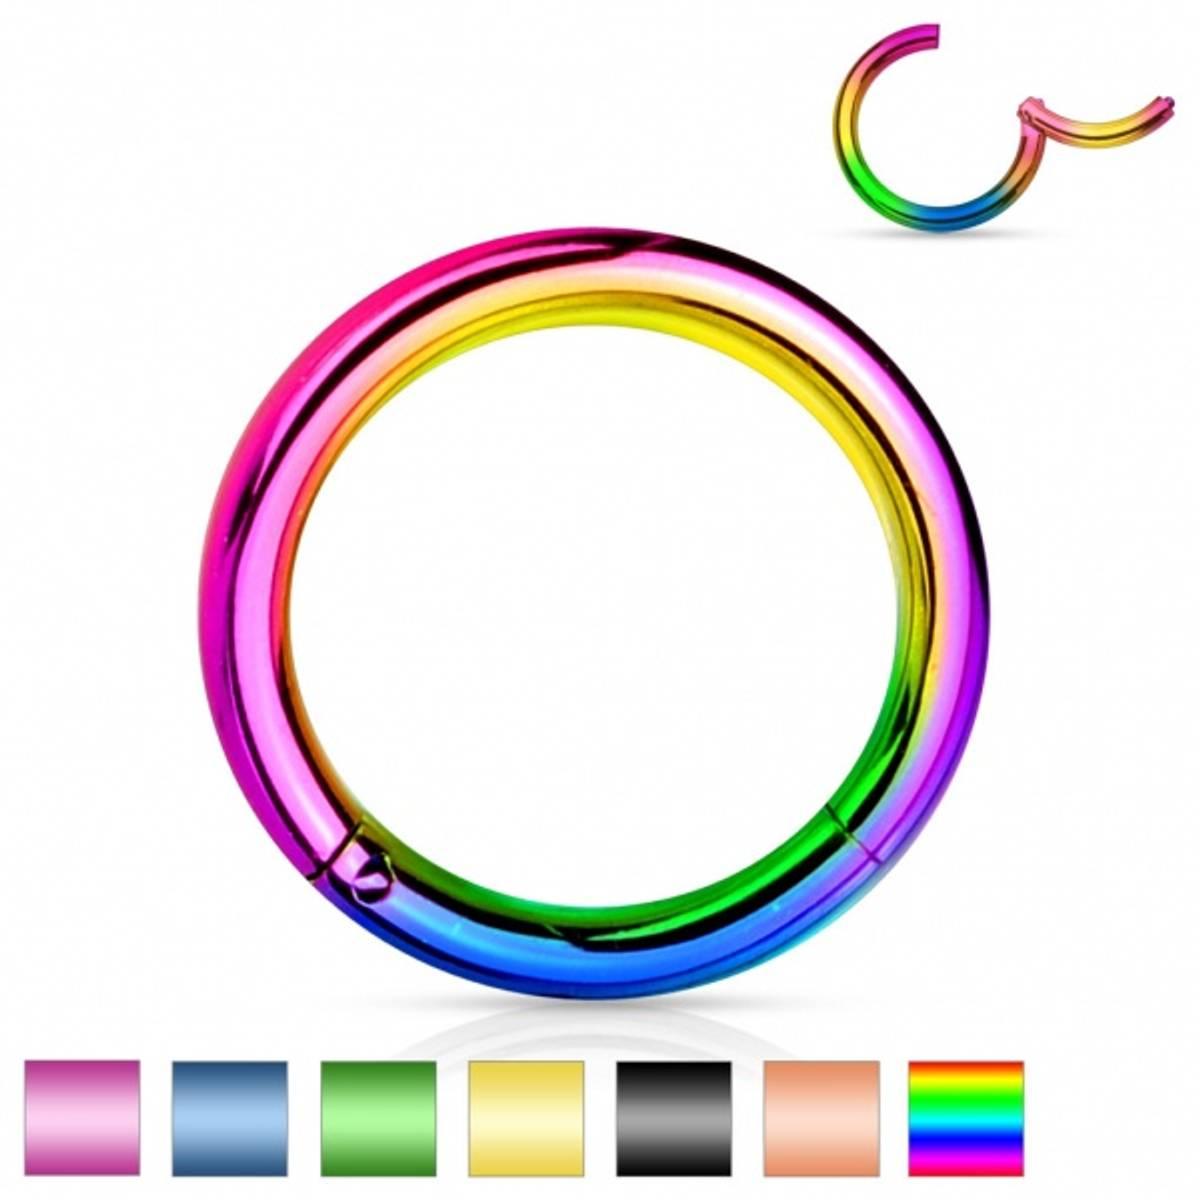 Hinged 1,2 x 8mm Segment Rings Color